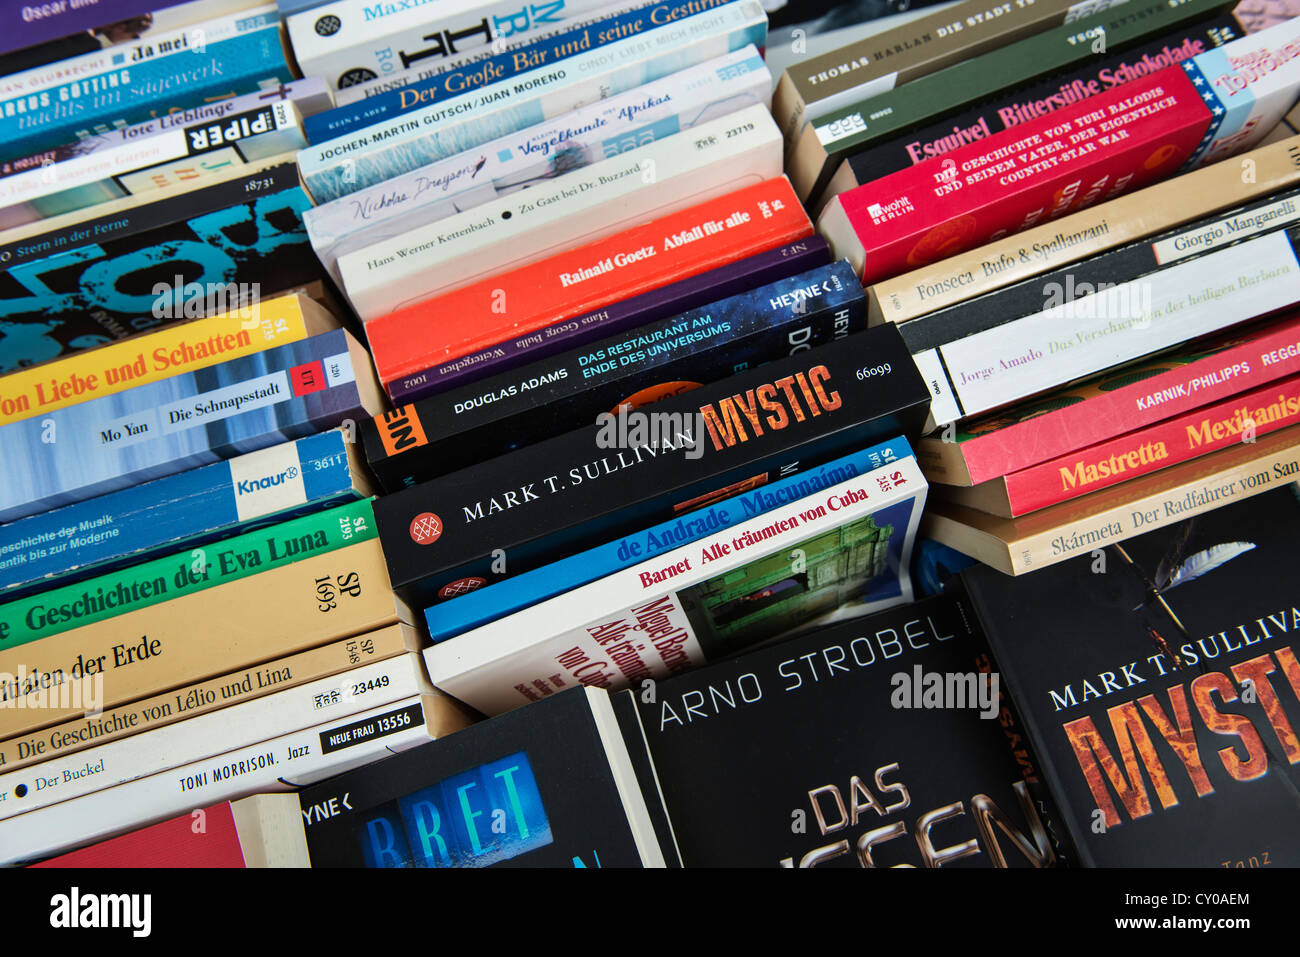 Book market, flea market, novels, paperbacks, fiction - Stock Image